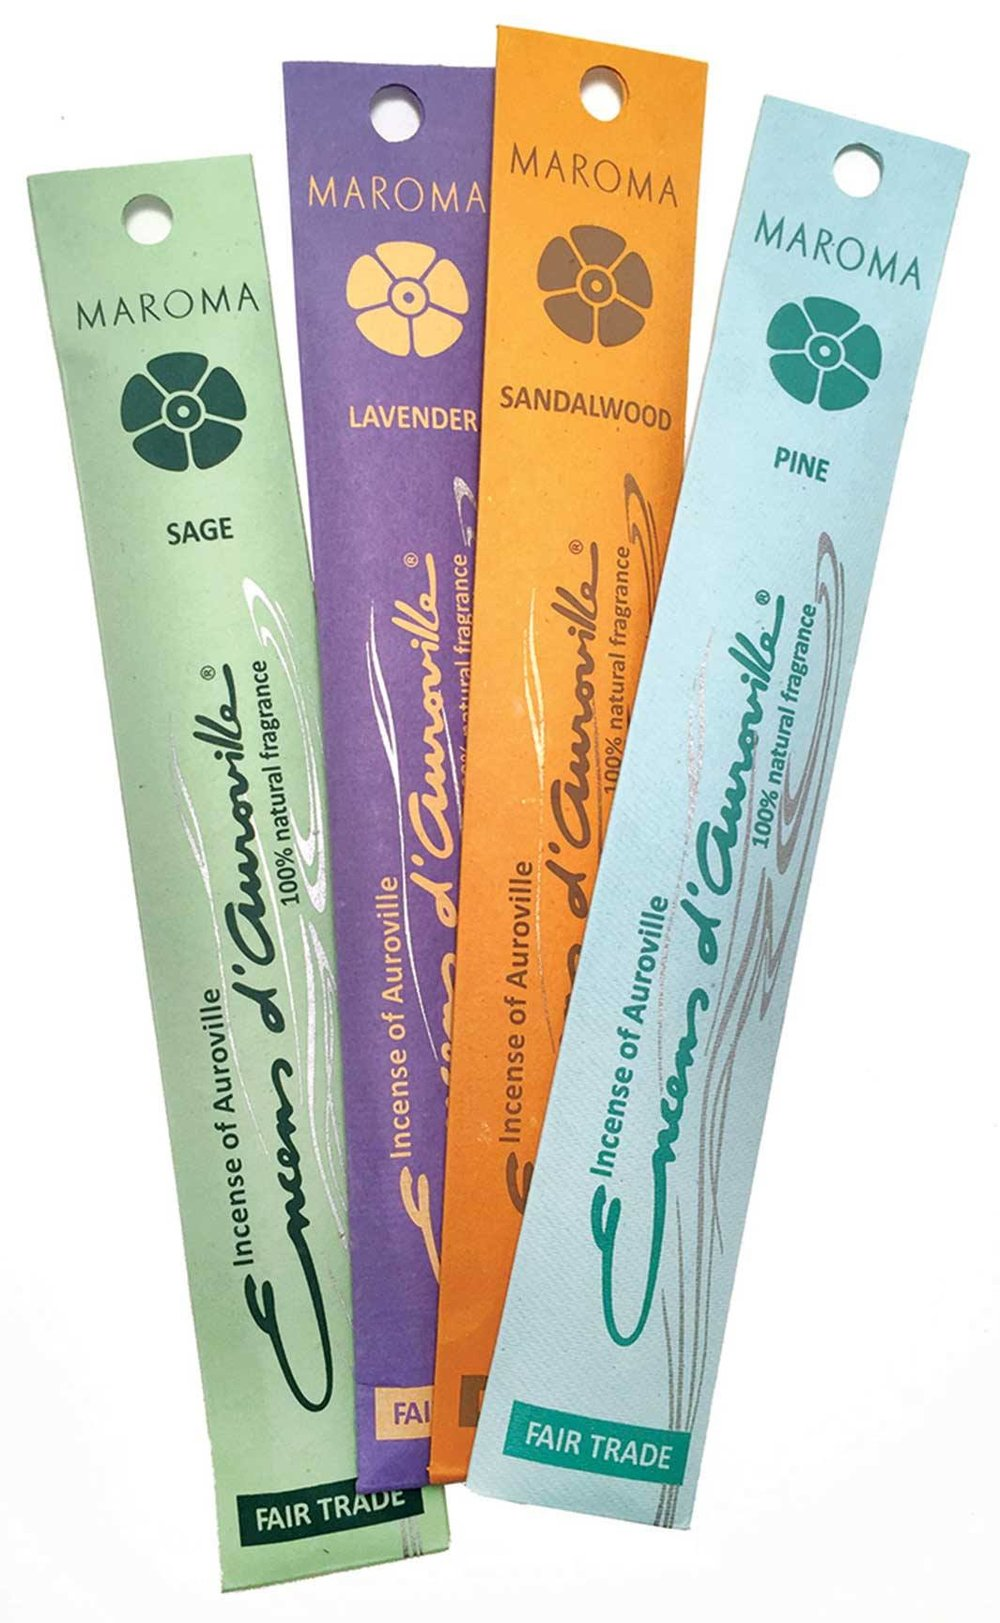 maroma incense.jpg